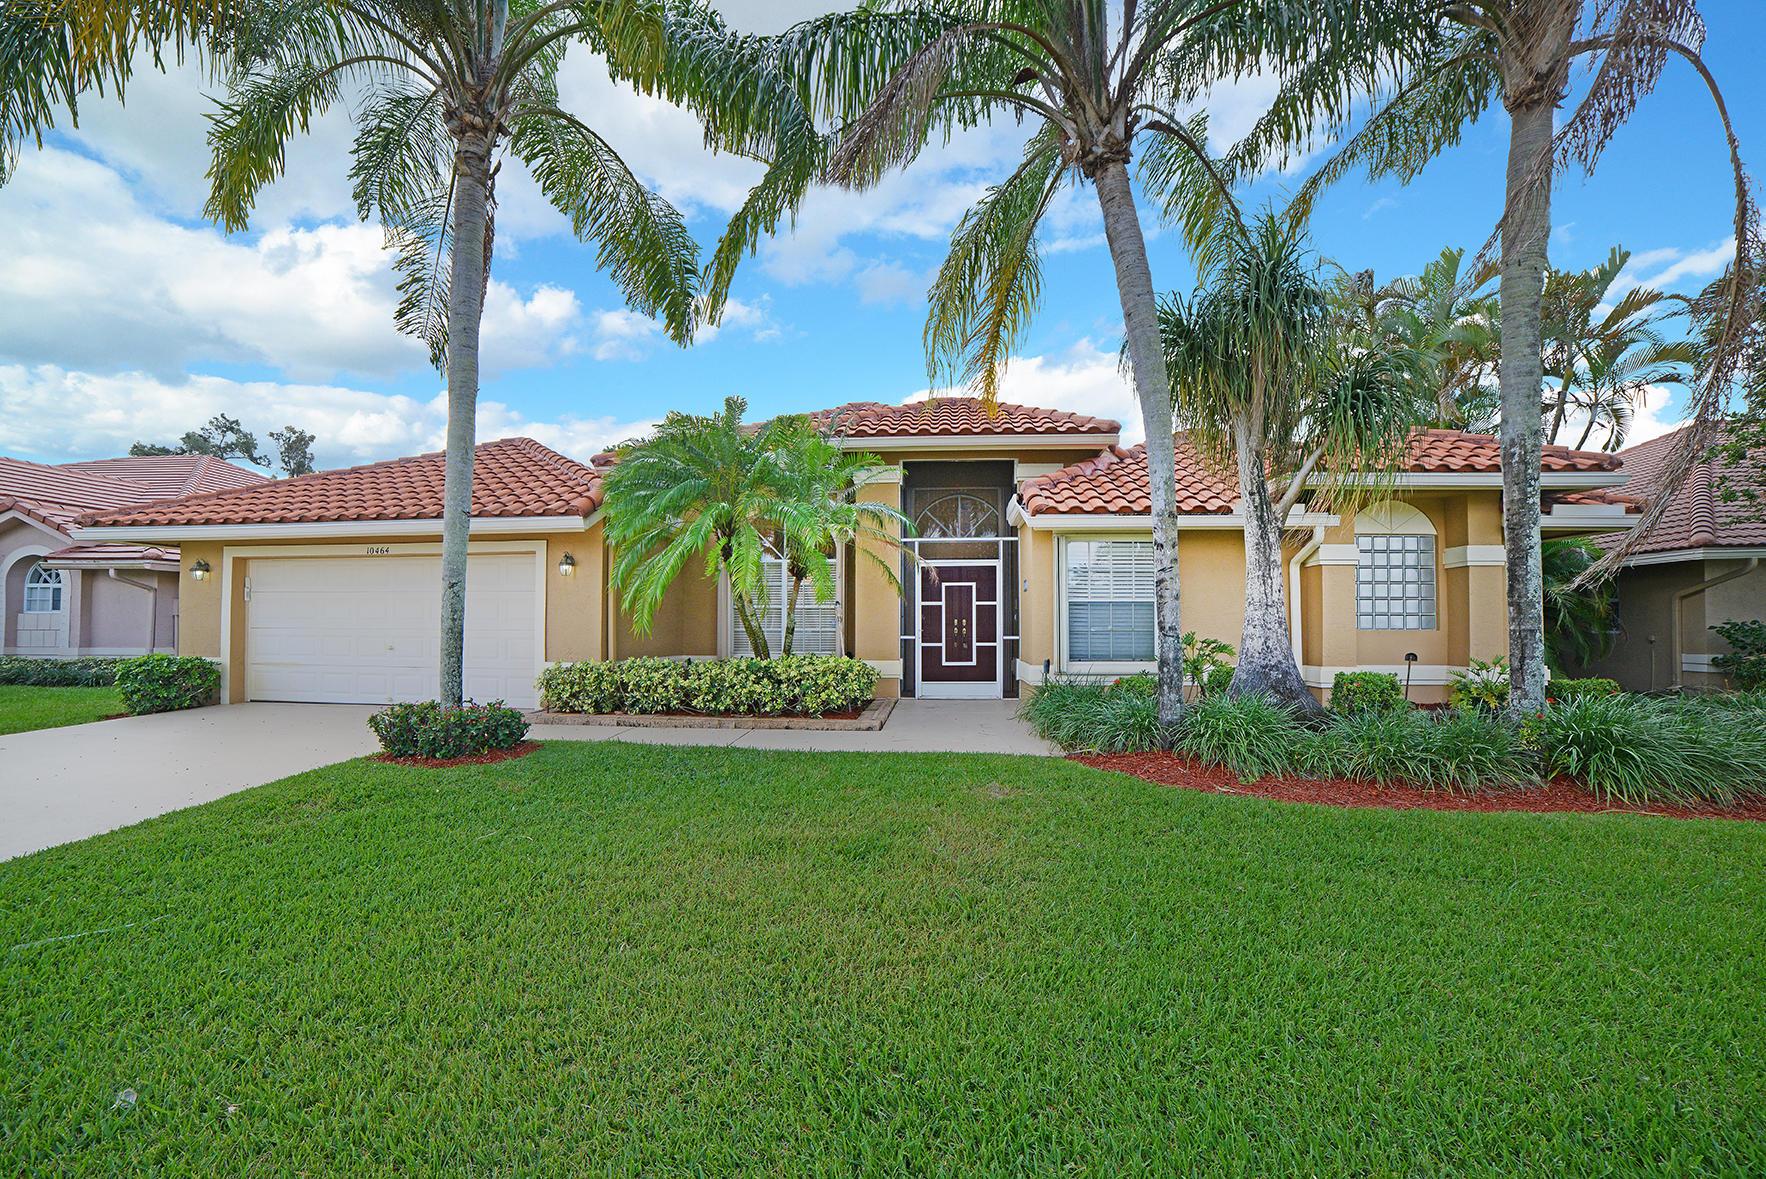 10464 Milburn Lane, Boca Raton, FL 33498